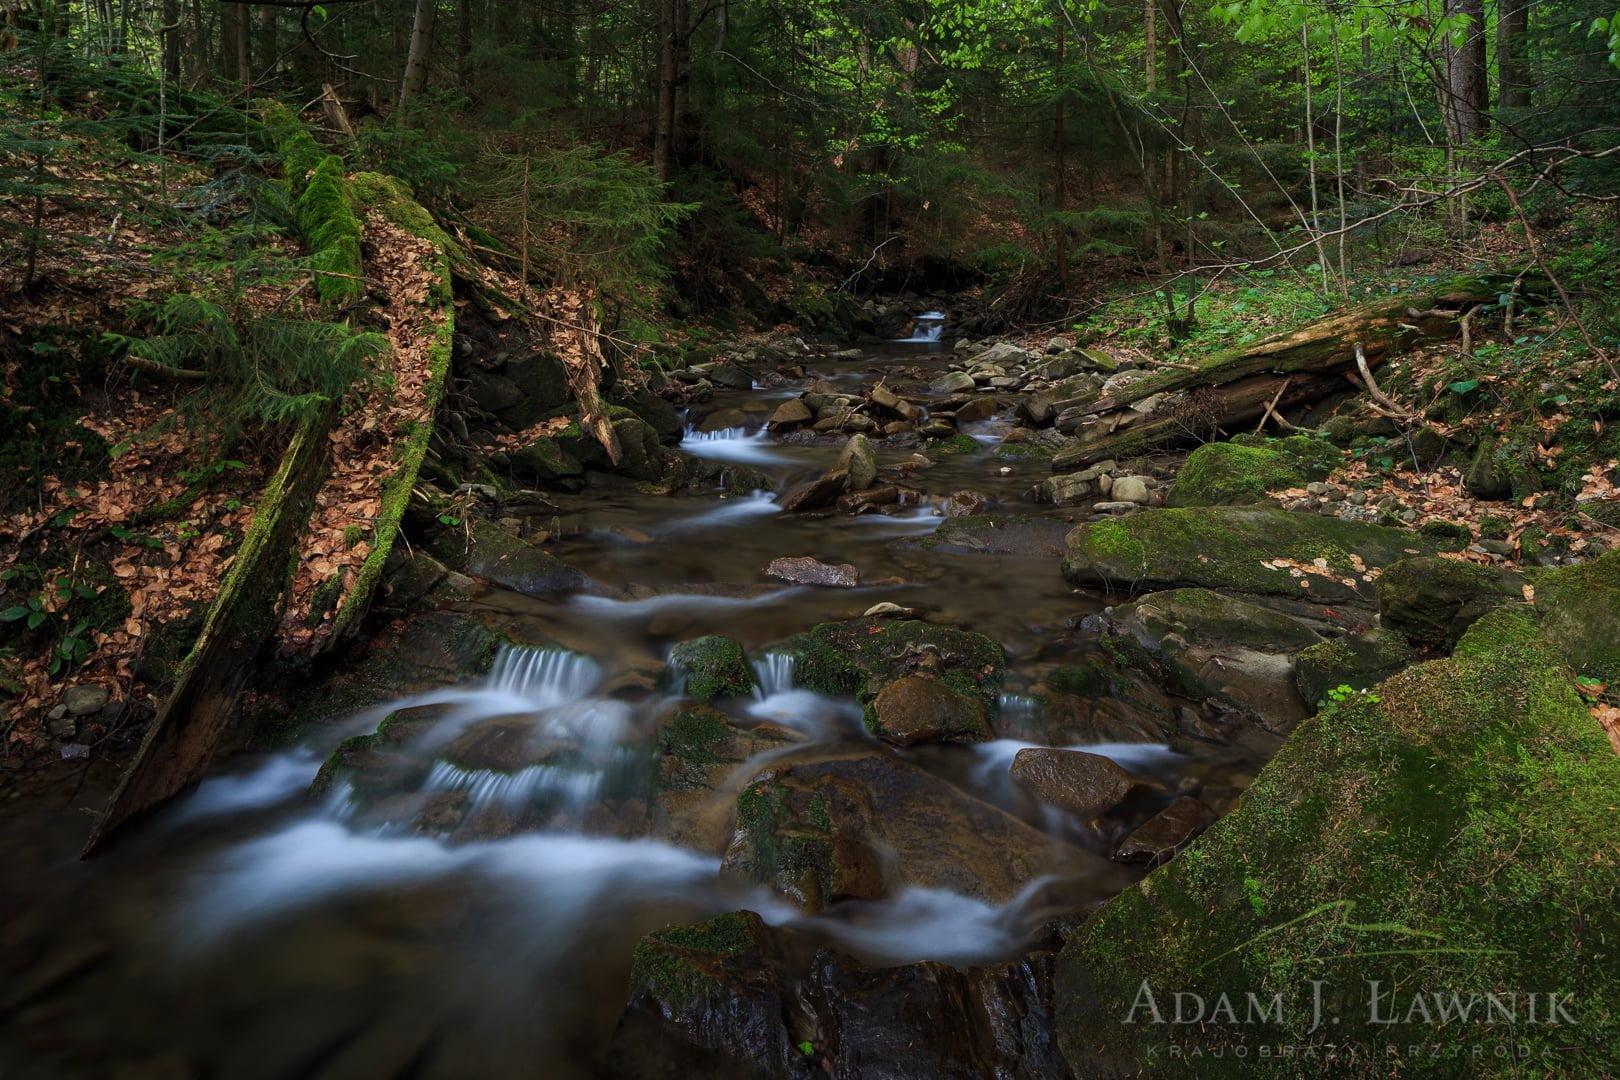 Gorce National Park, Poland 1505-00850C